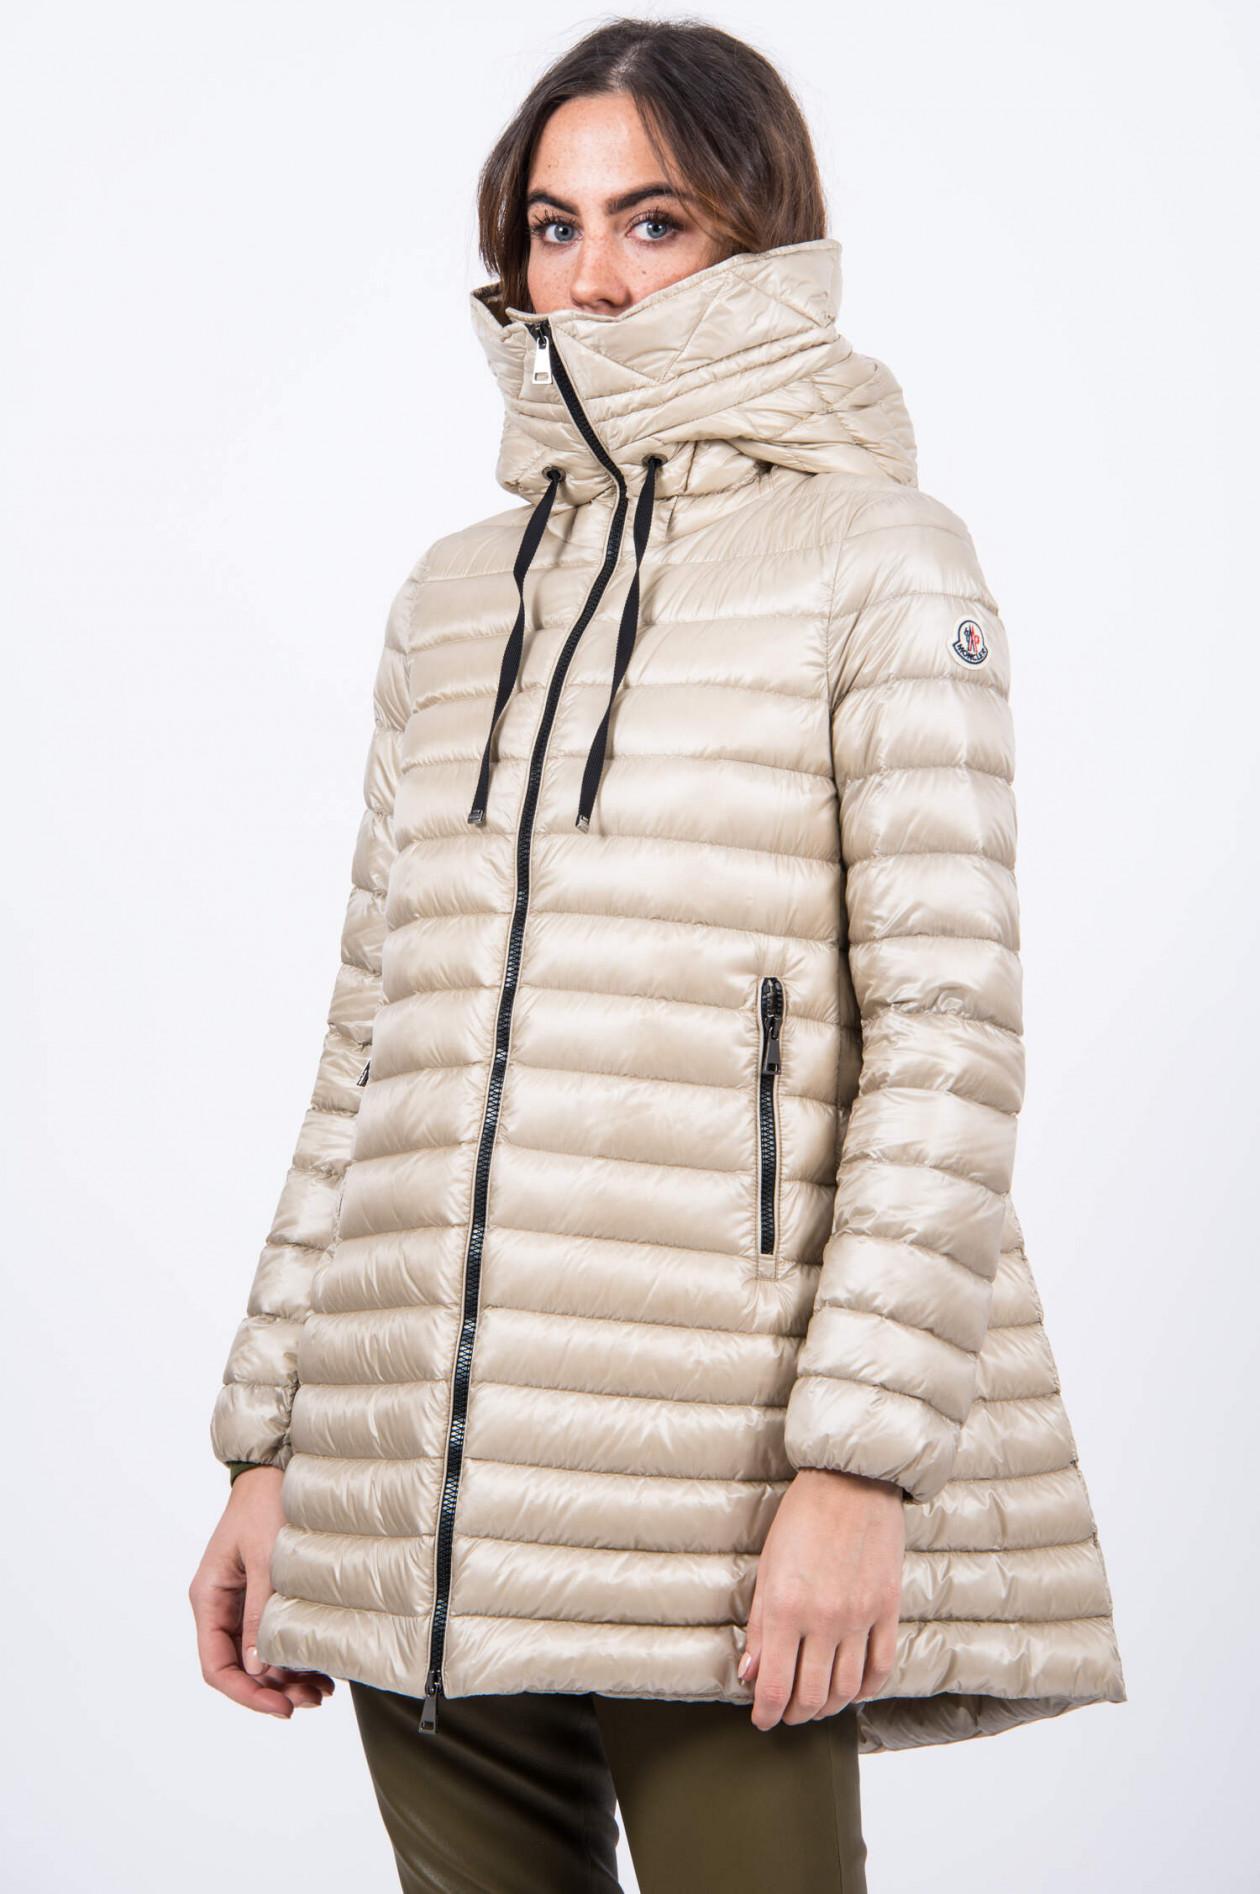 Moncler Mantel schwarz Grösse 2 (M)